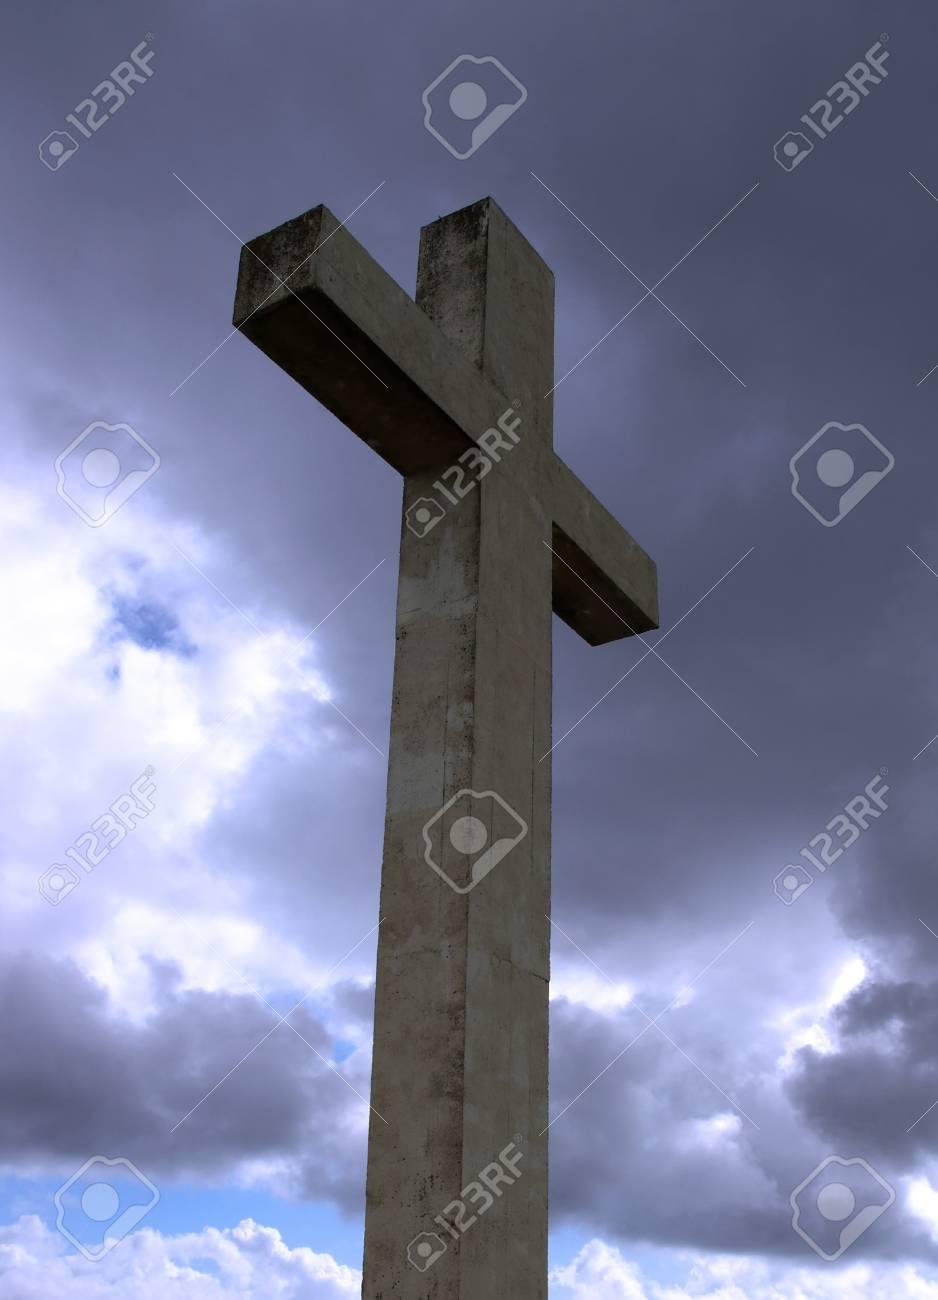 concrete Cross on top of bear island in county Cork Ireland Stock Photo - 3547867